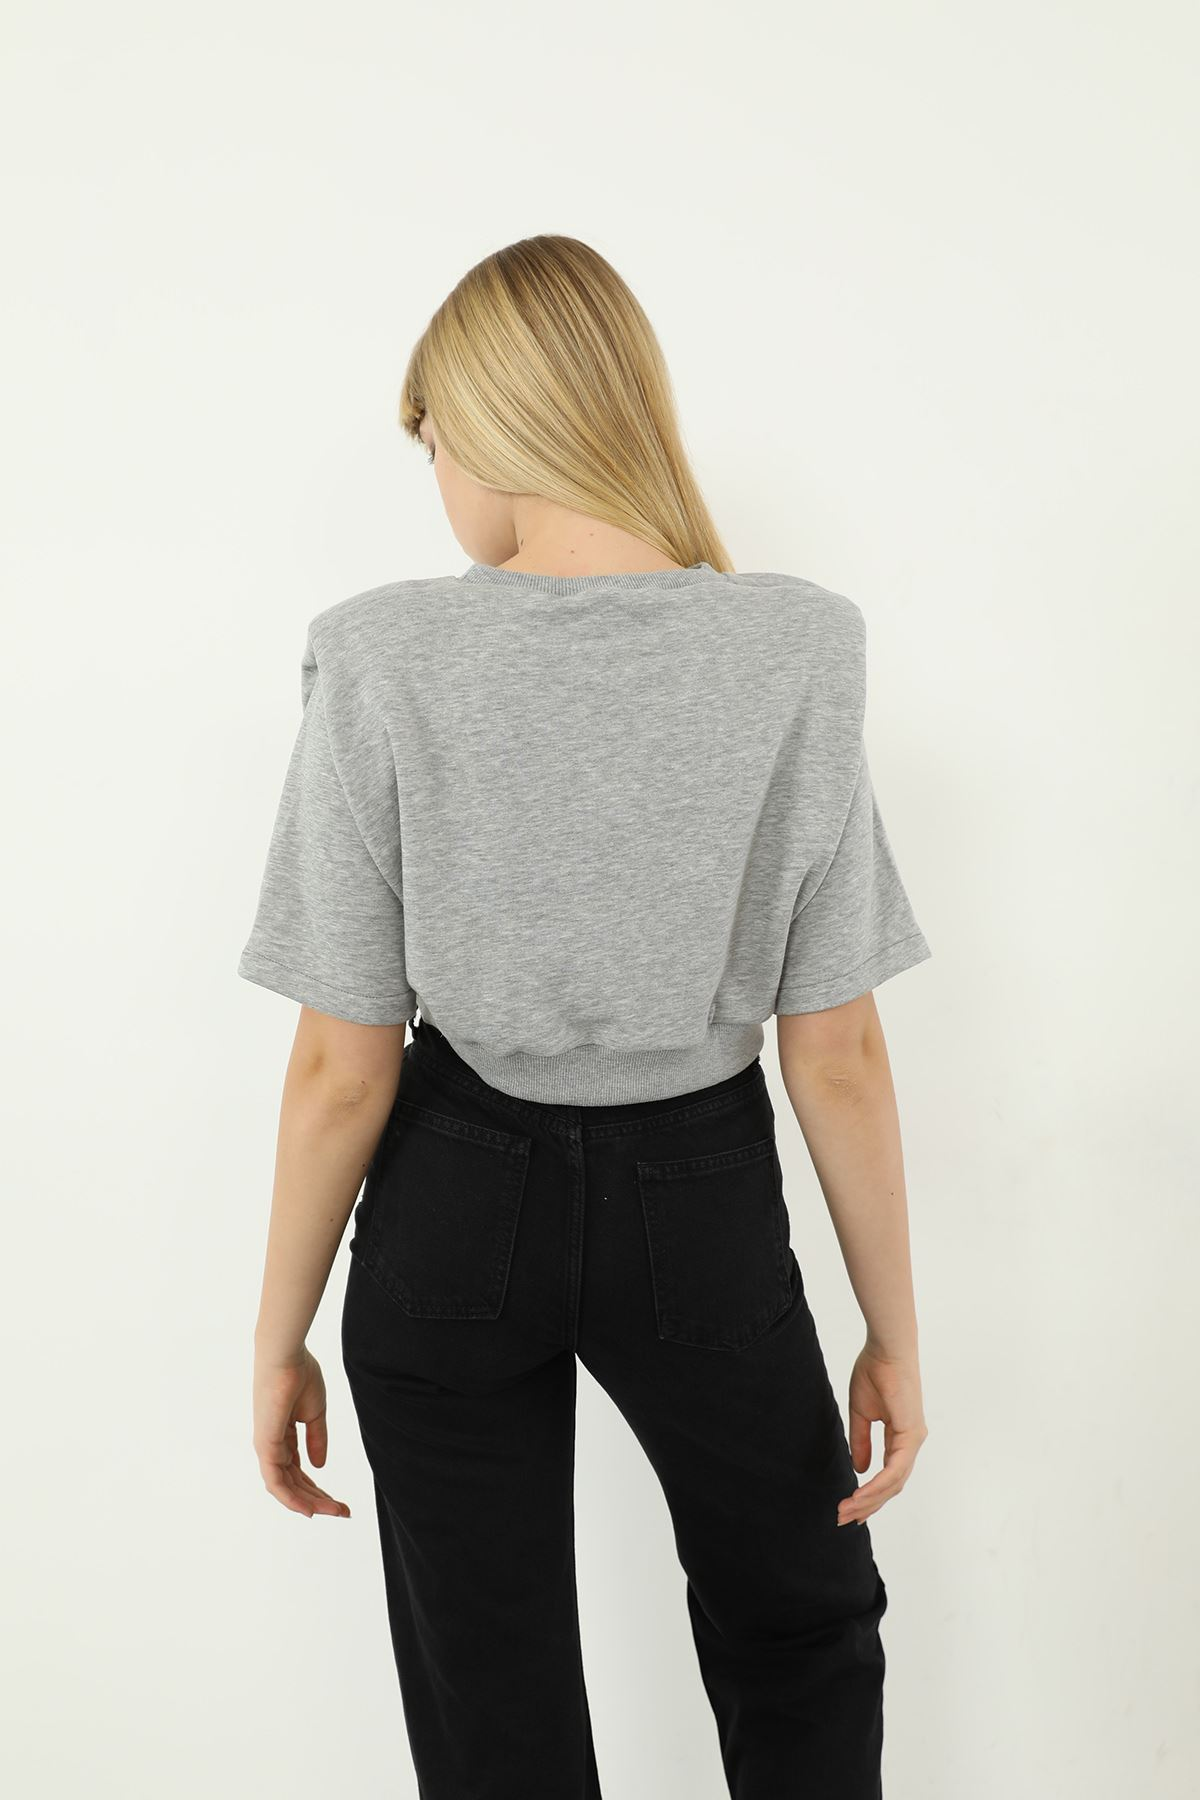 Vatkalı Kısa Kol Sweatshirt-Gri